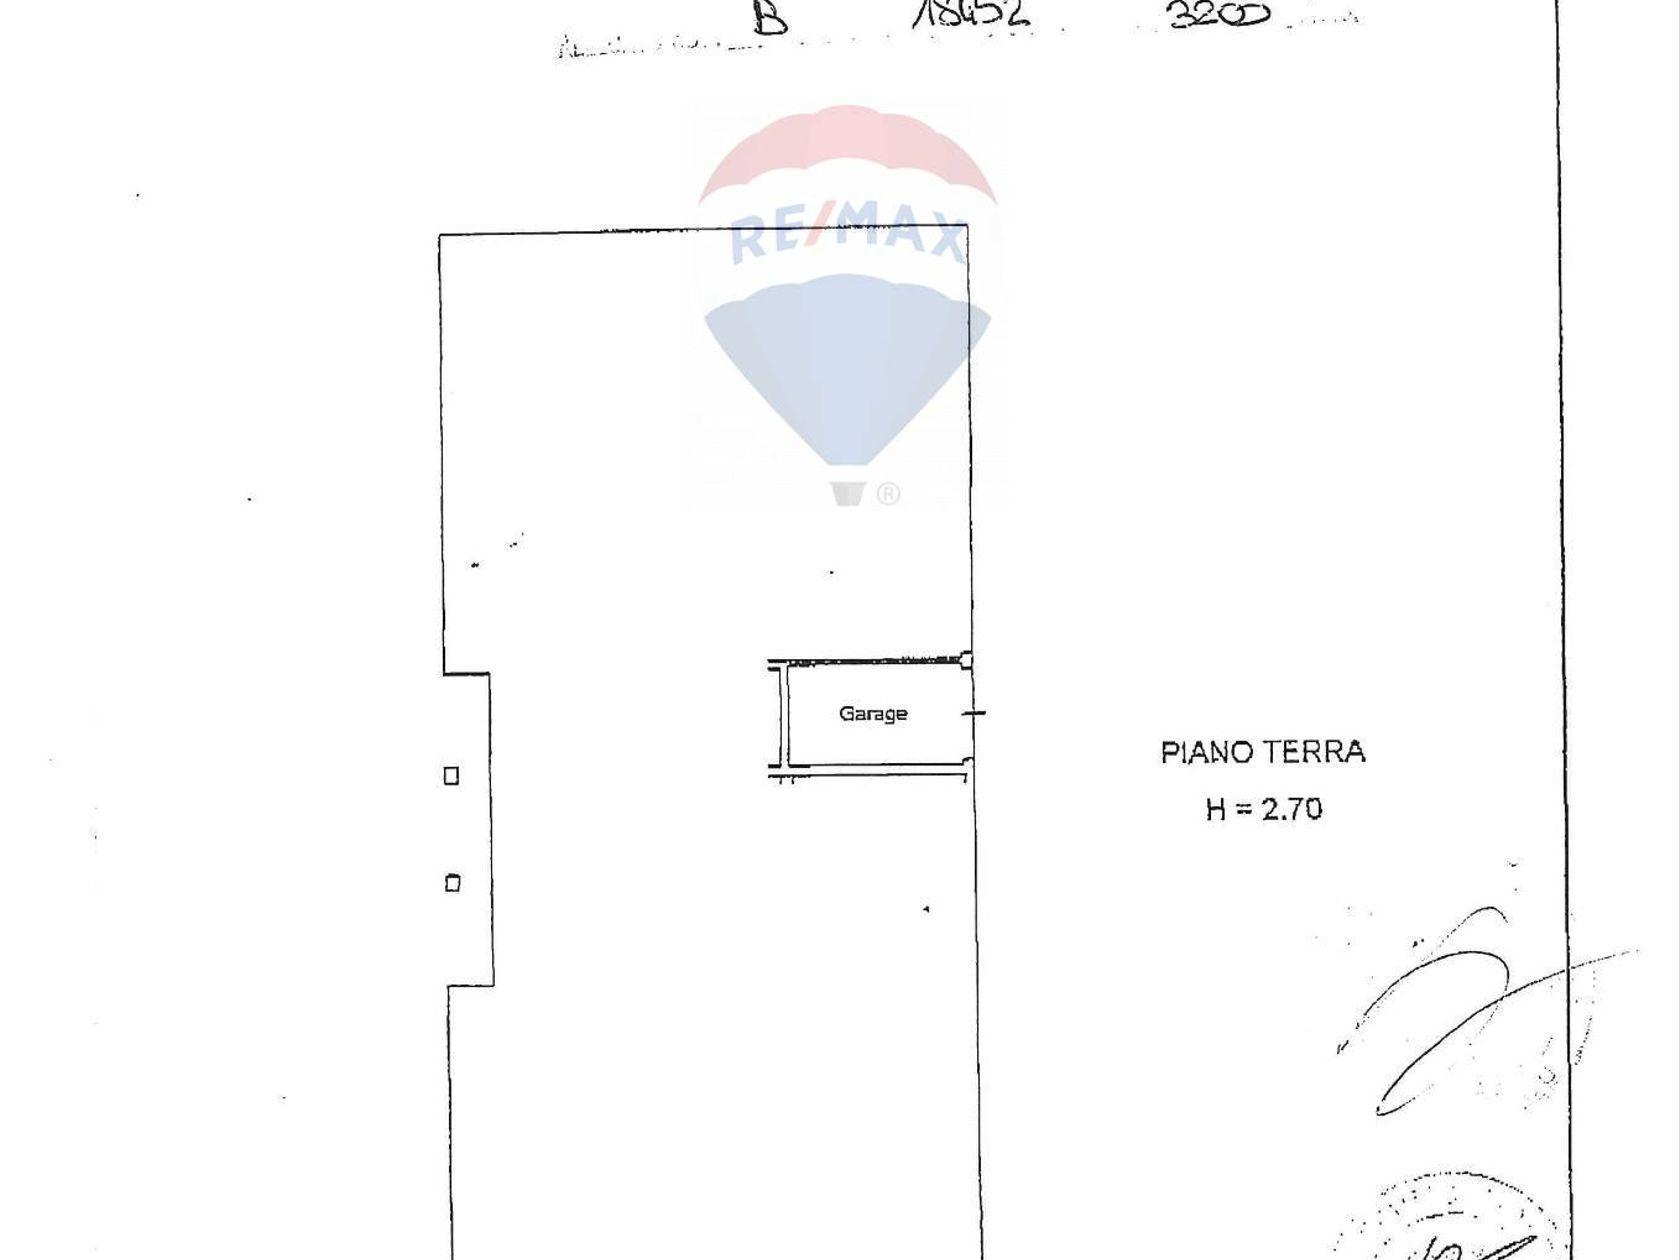 Appartamento Cantarana, Cona, VE Vendita - Planimetria 2